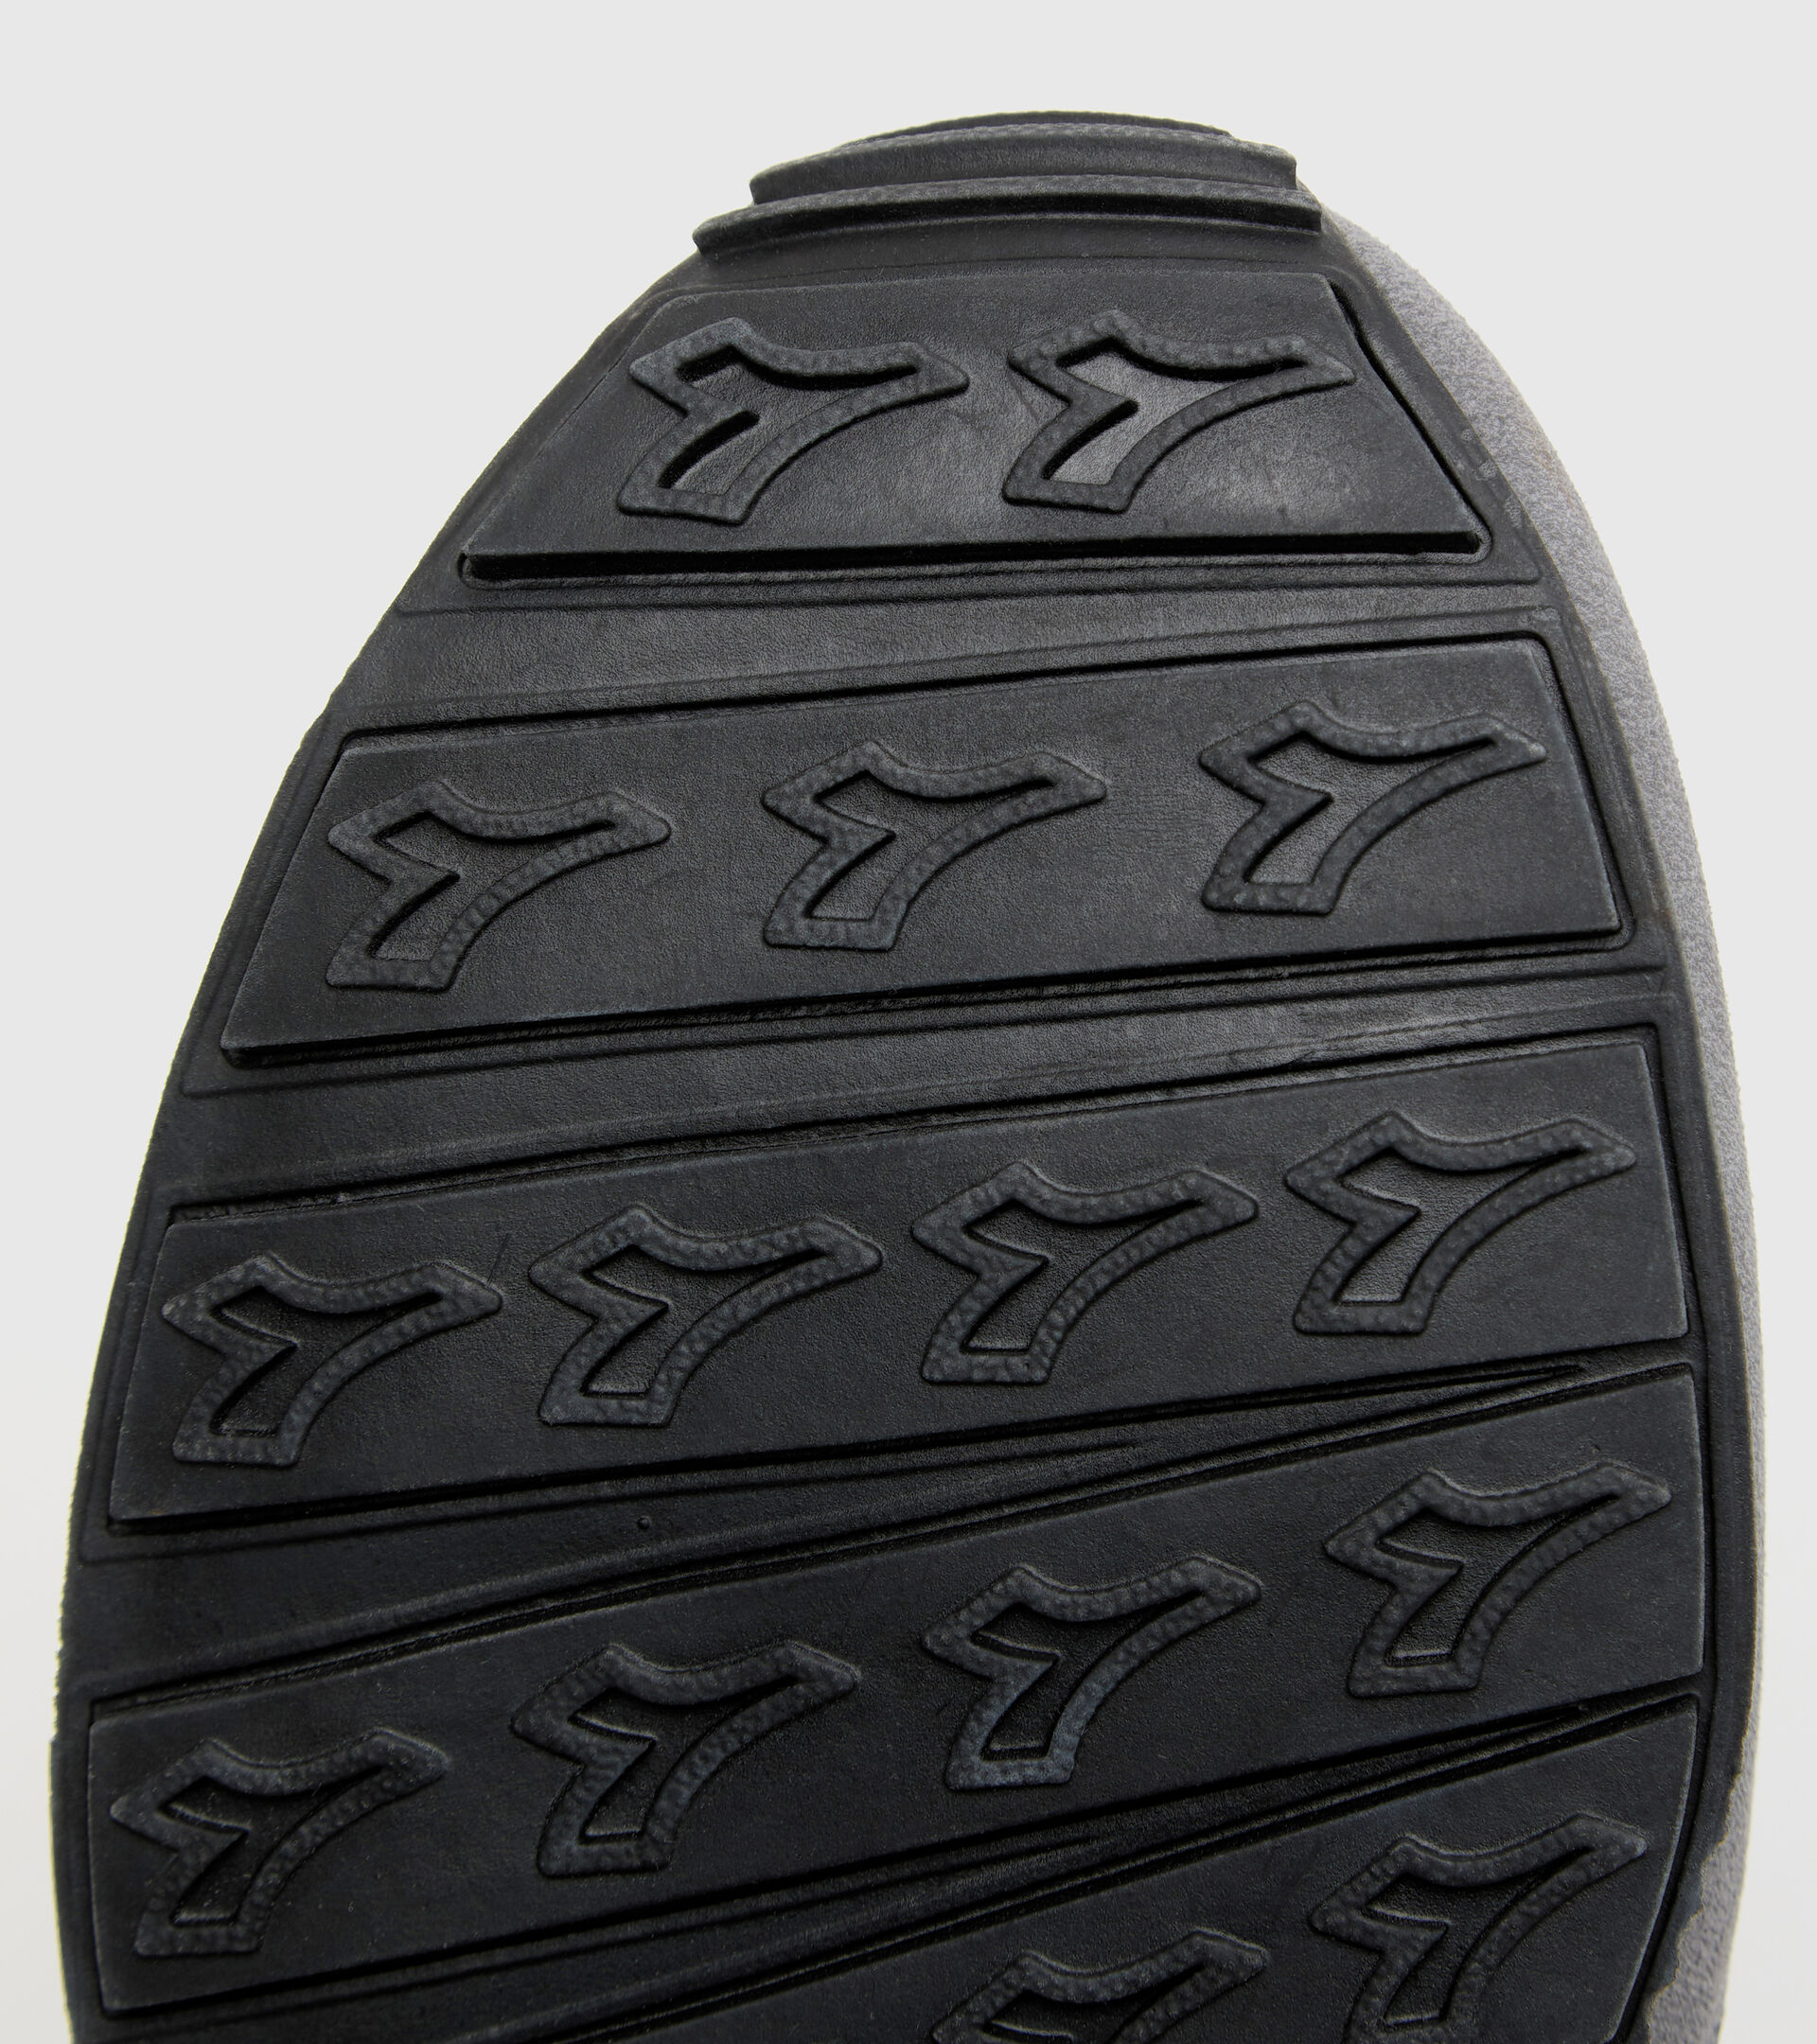 Scarpa sportiva - Unisex CAMARO METAL NERO - Diadora